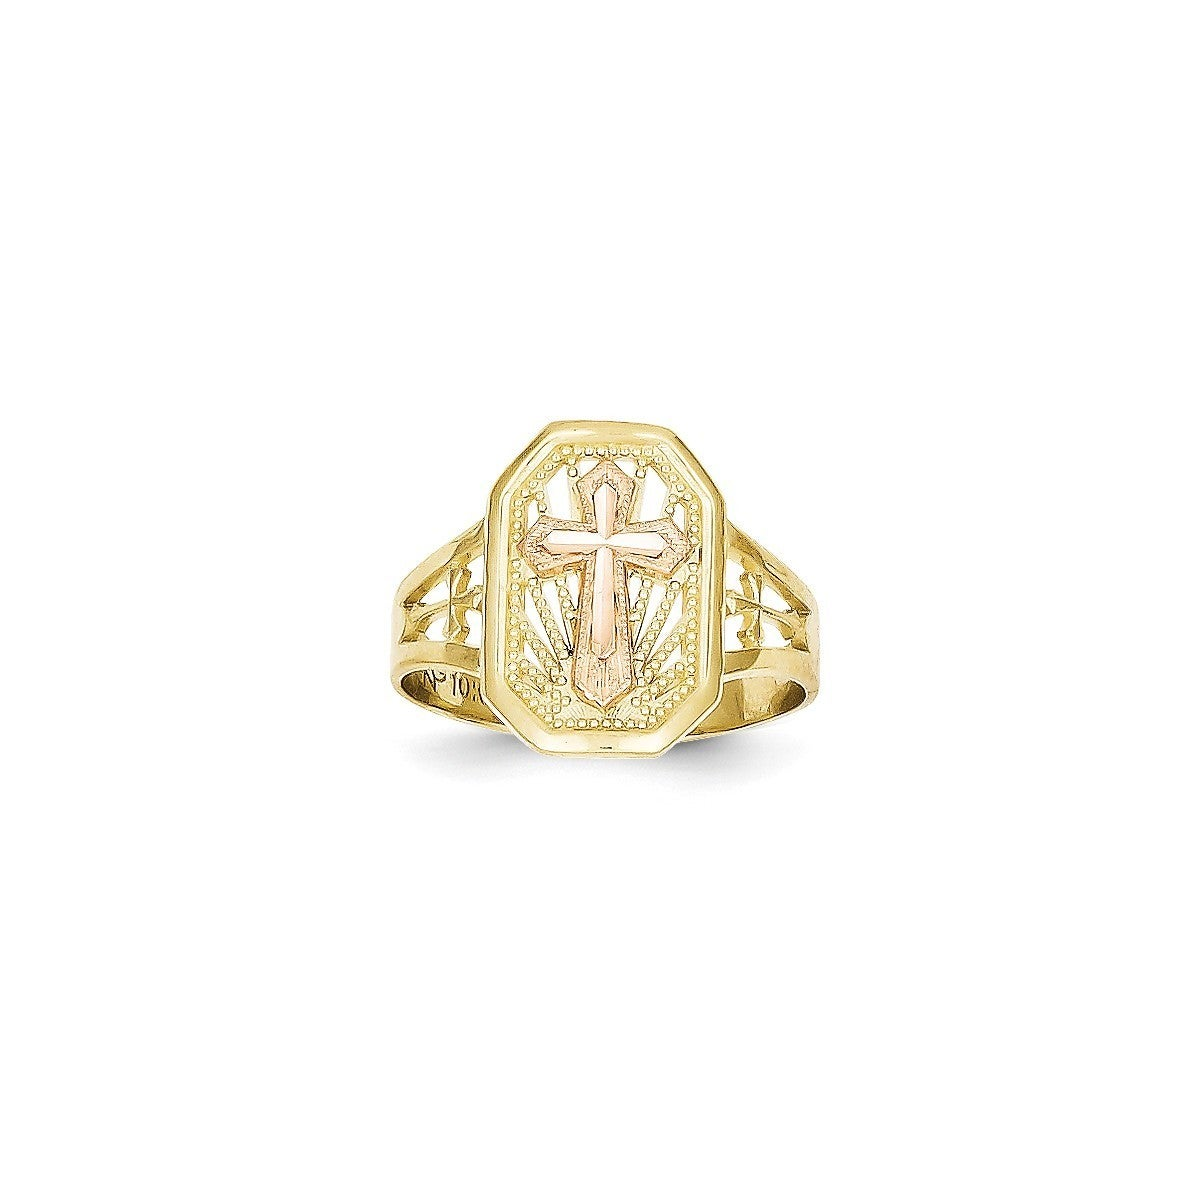 10 Karat Gold Twotone Filigree Cross Ring Free Shipping Today